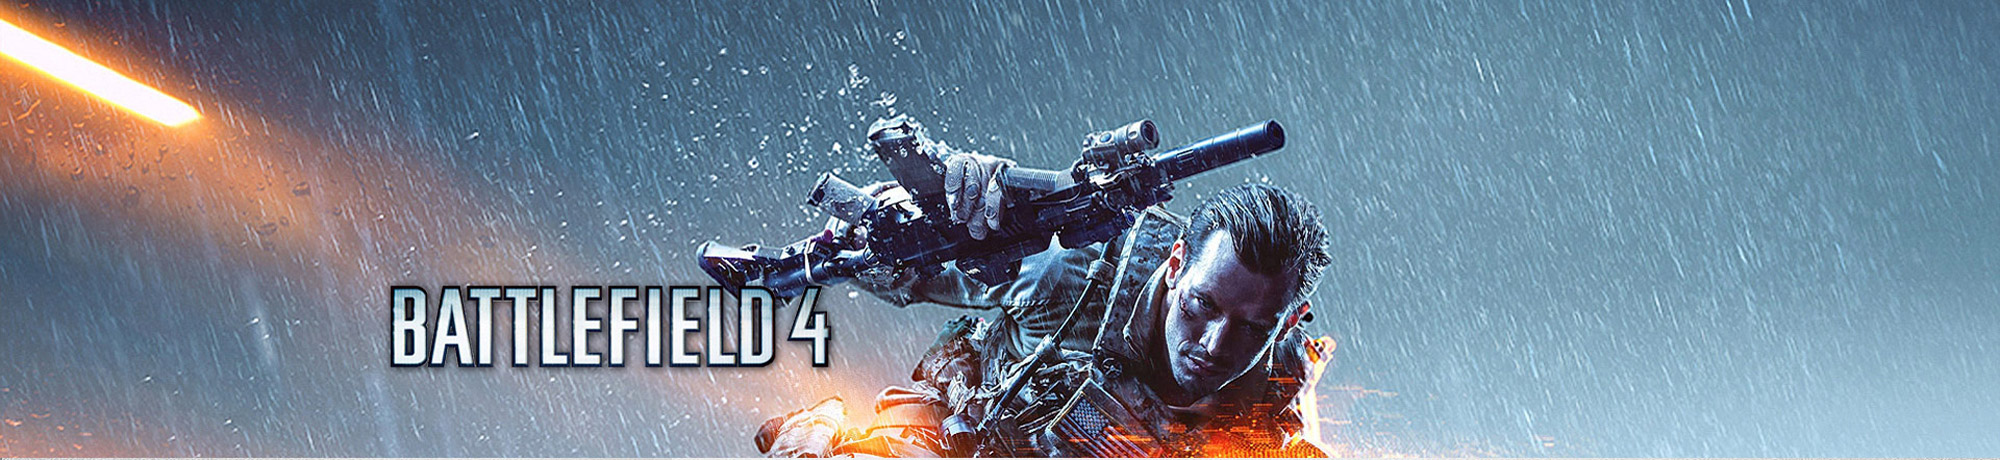 Battlefield 4 :: Στοιχεία Παιχνιδιού